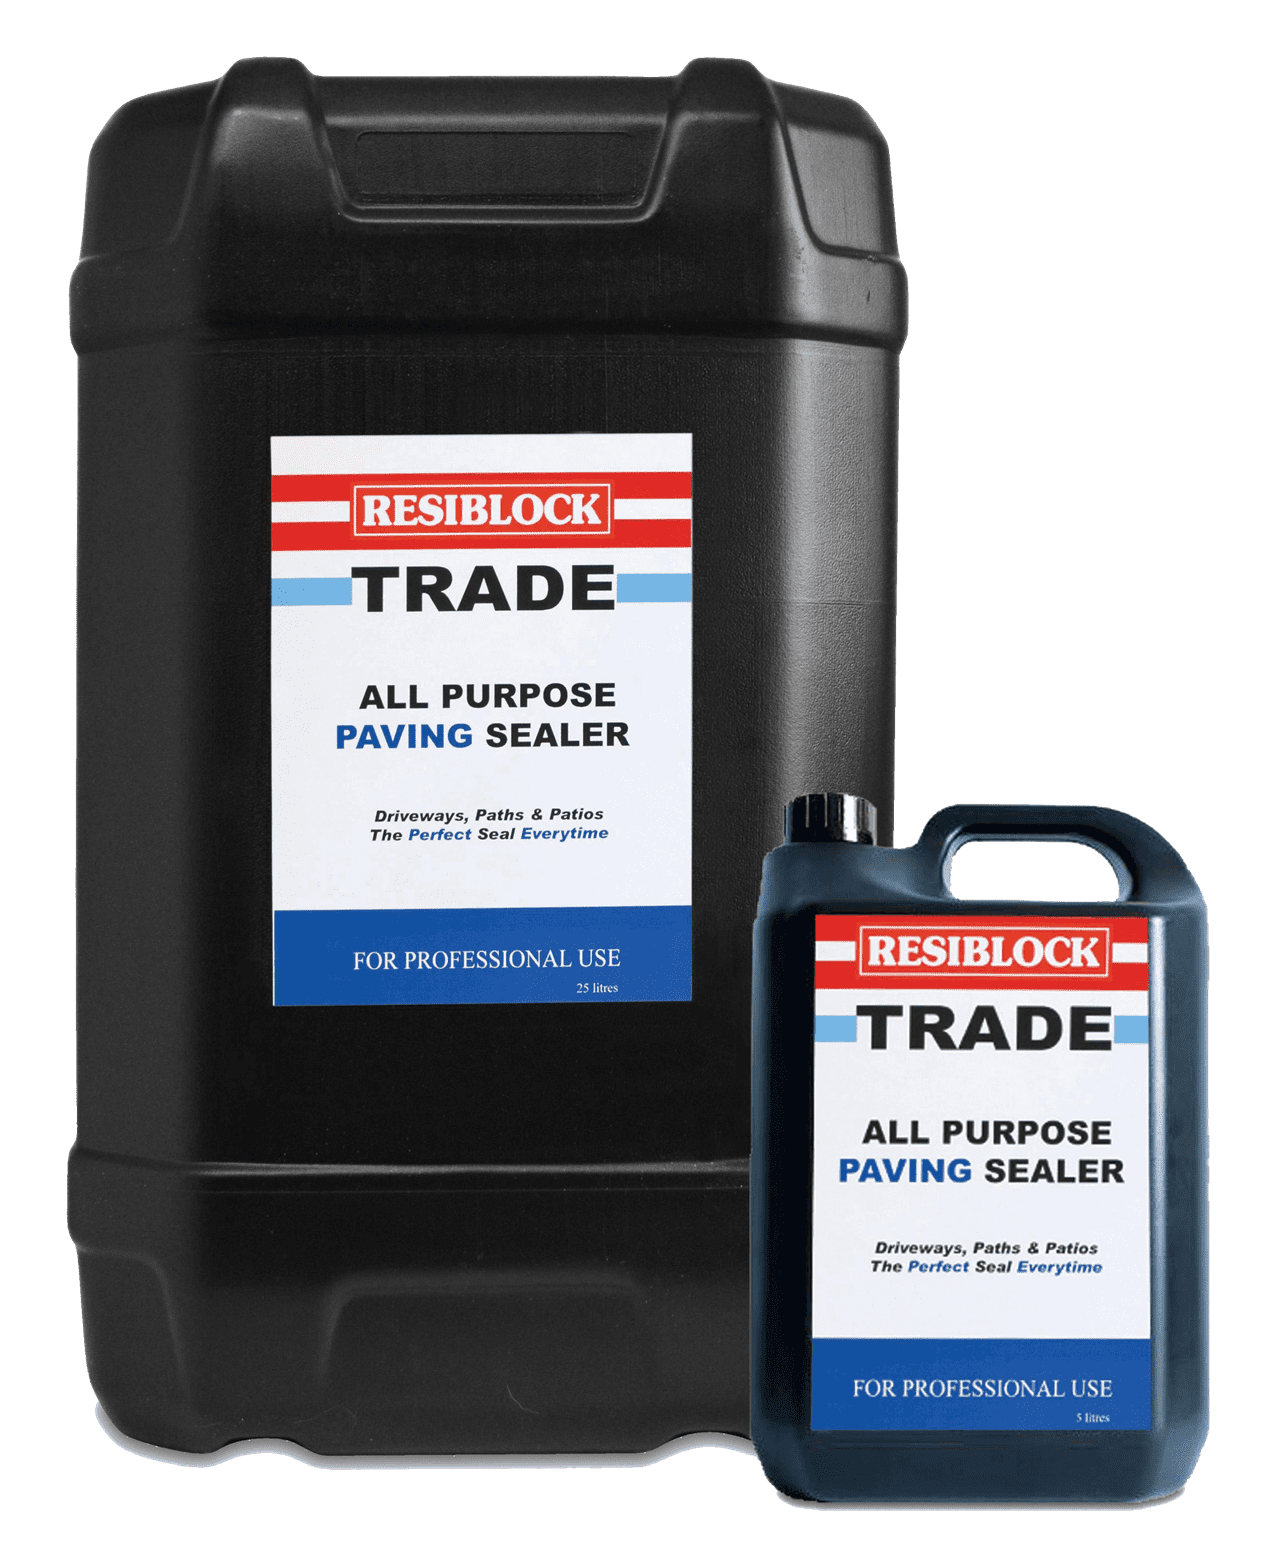 Resiblock Trade All Purpose Paving Sealer 25L